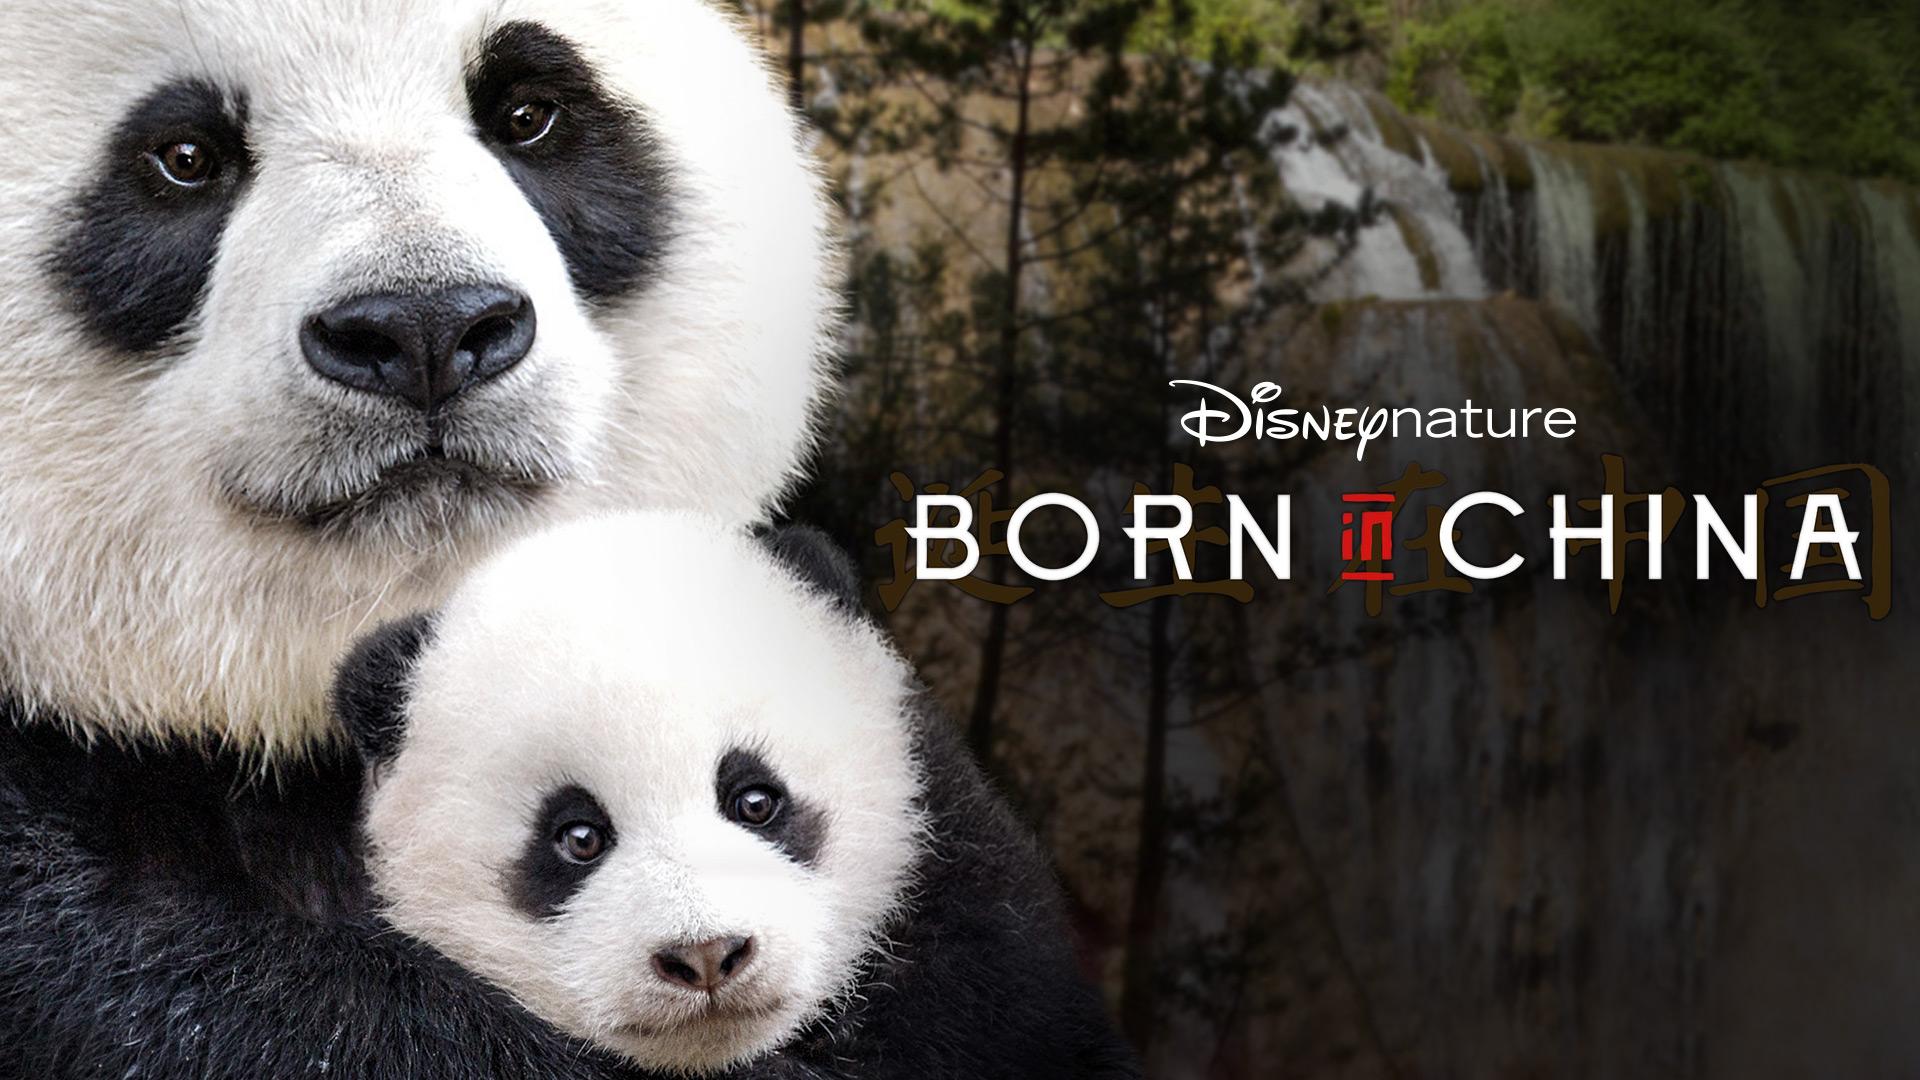 Disneynature: Born in China (Theatrical Version)